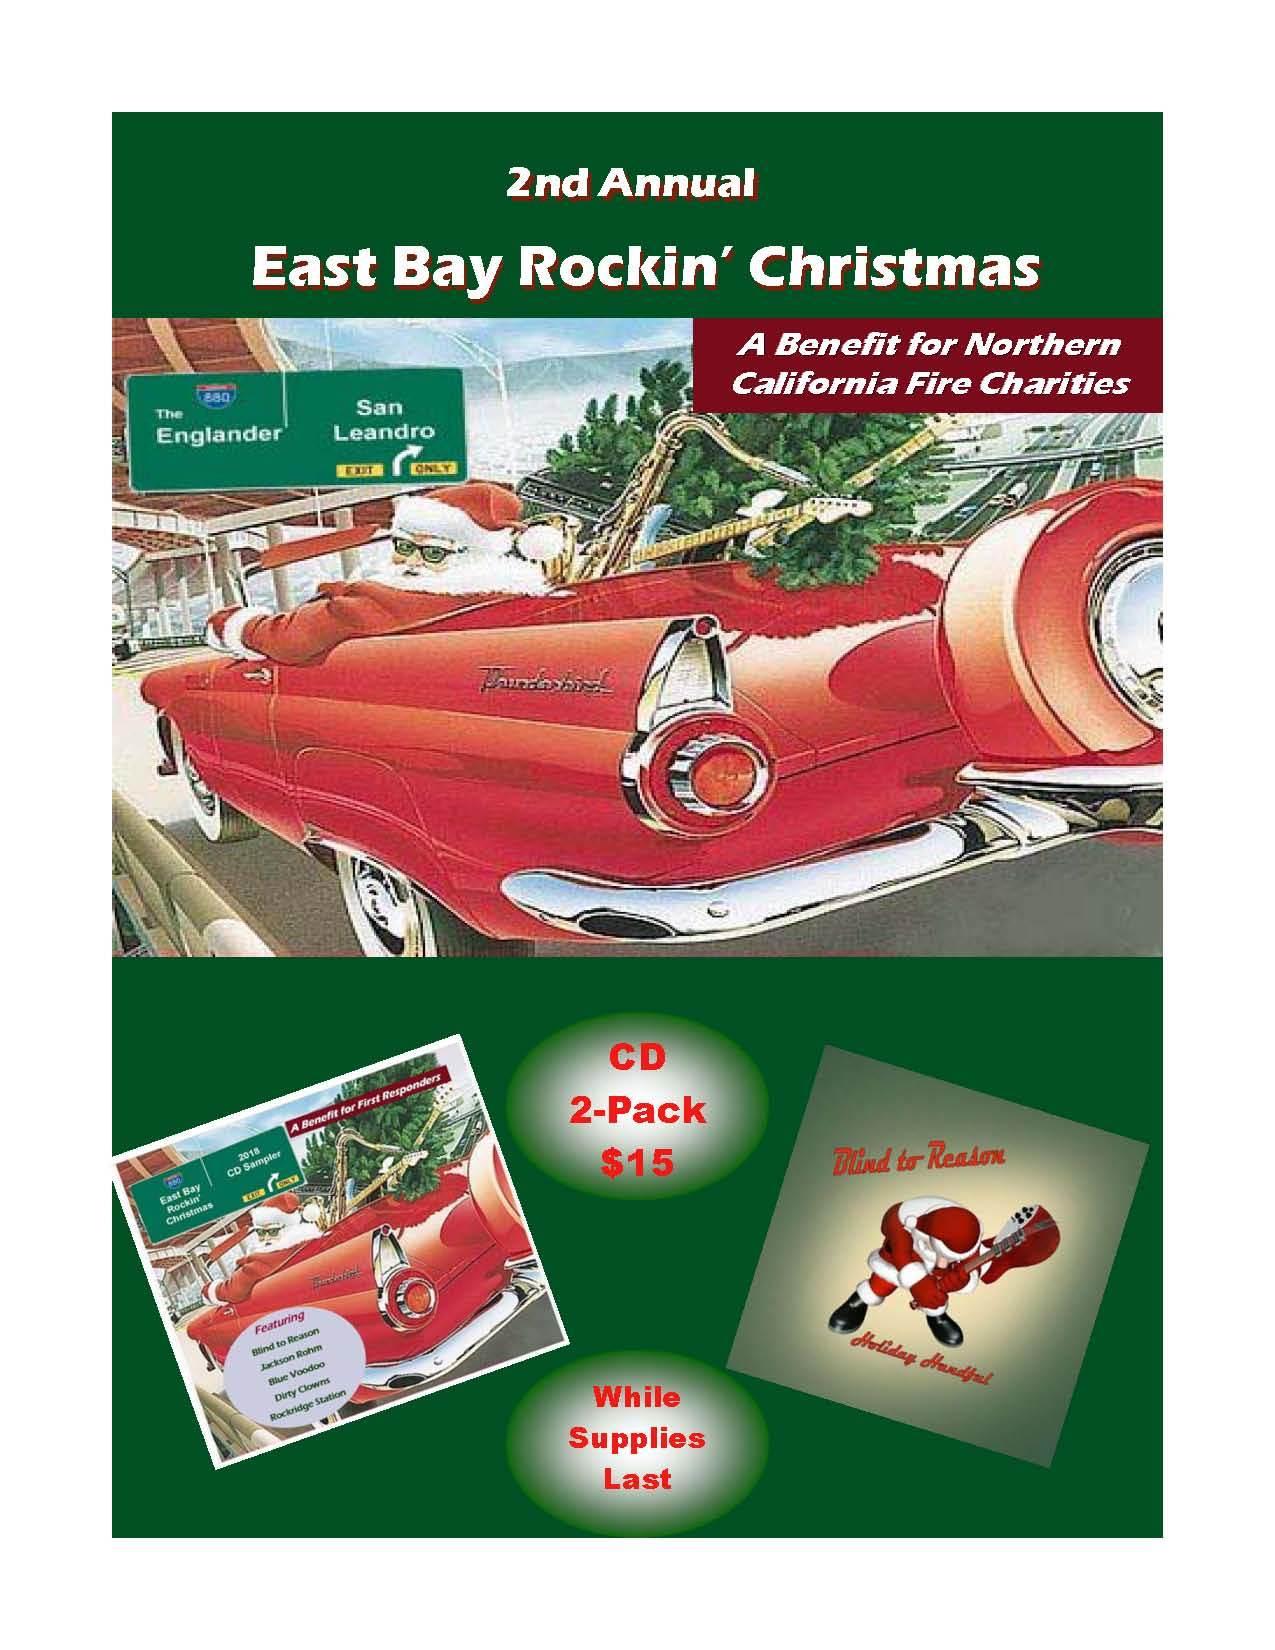 East Bay Rockin Christmas 2018 CD 2-Pack 00001